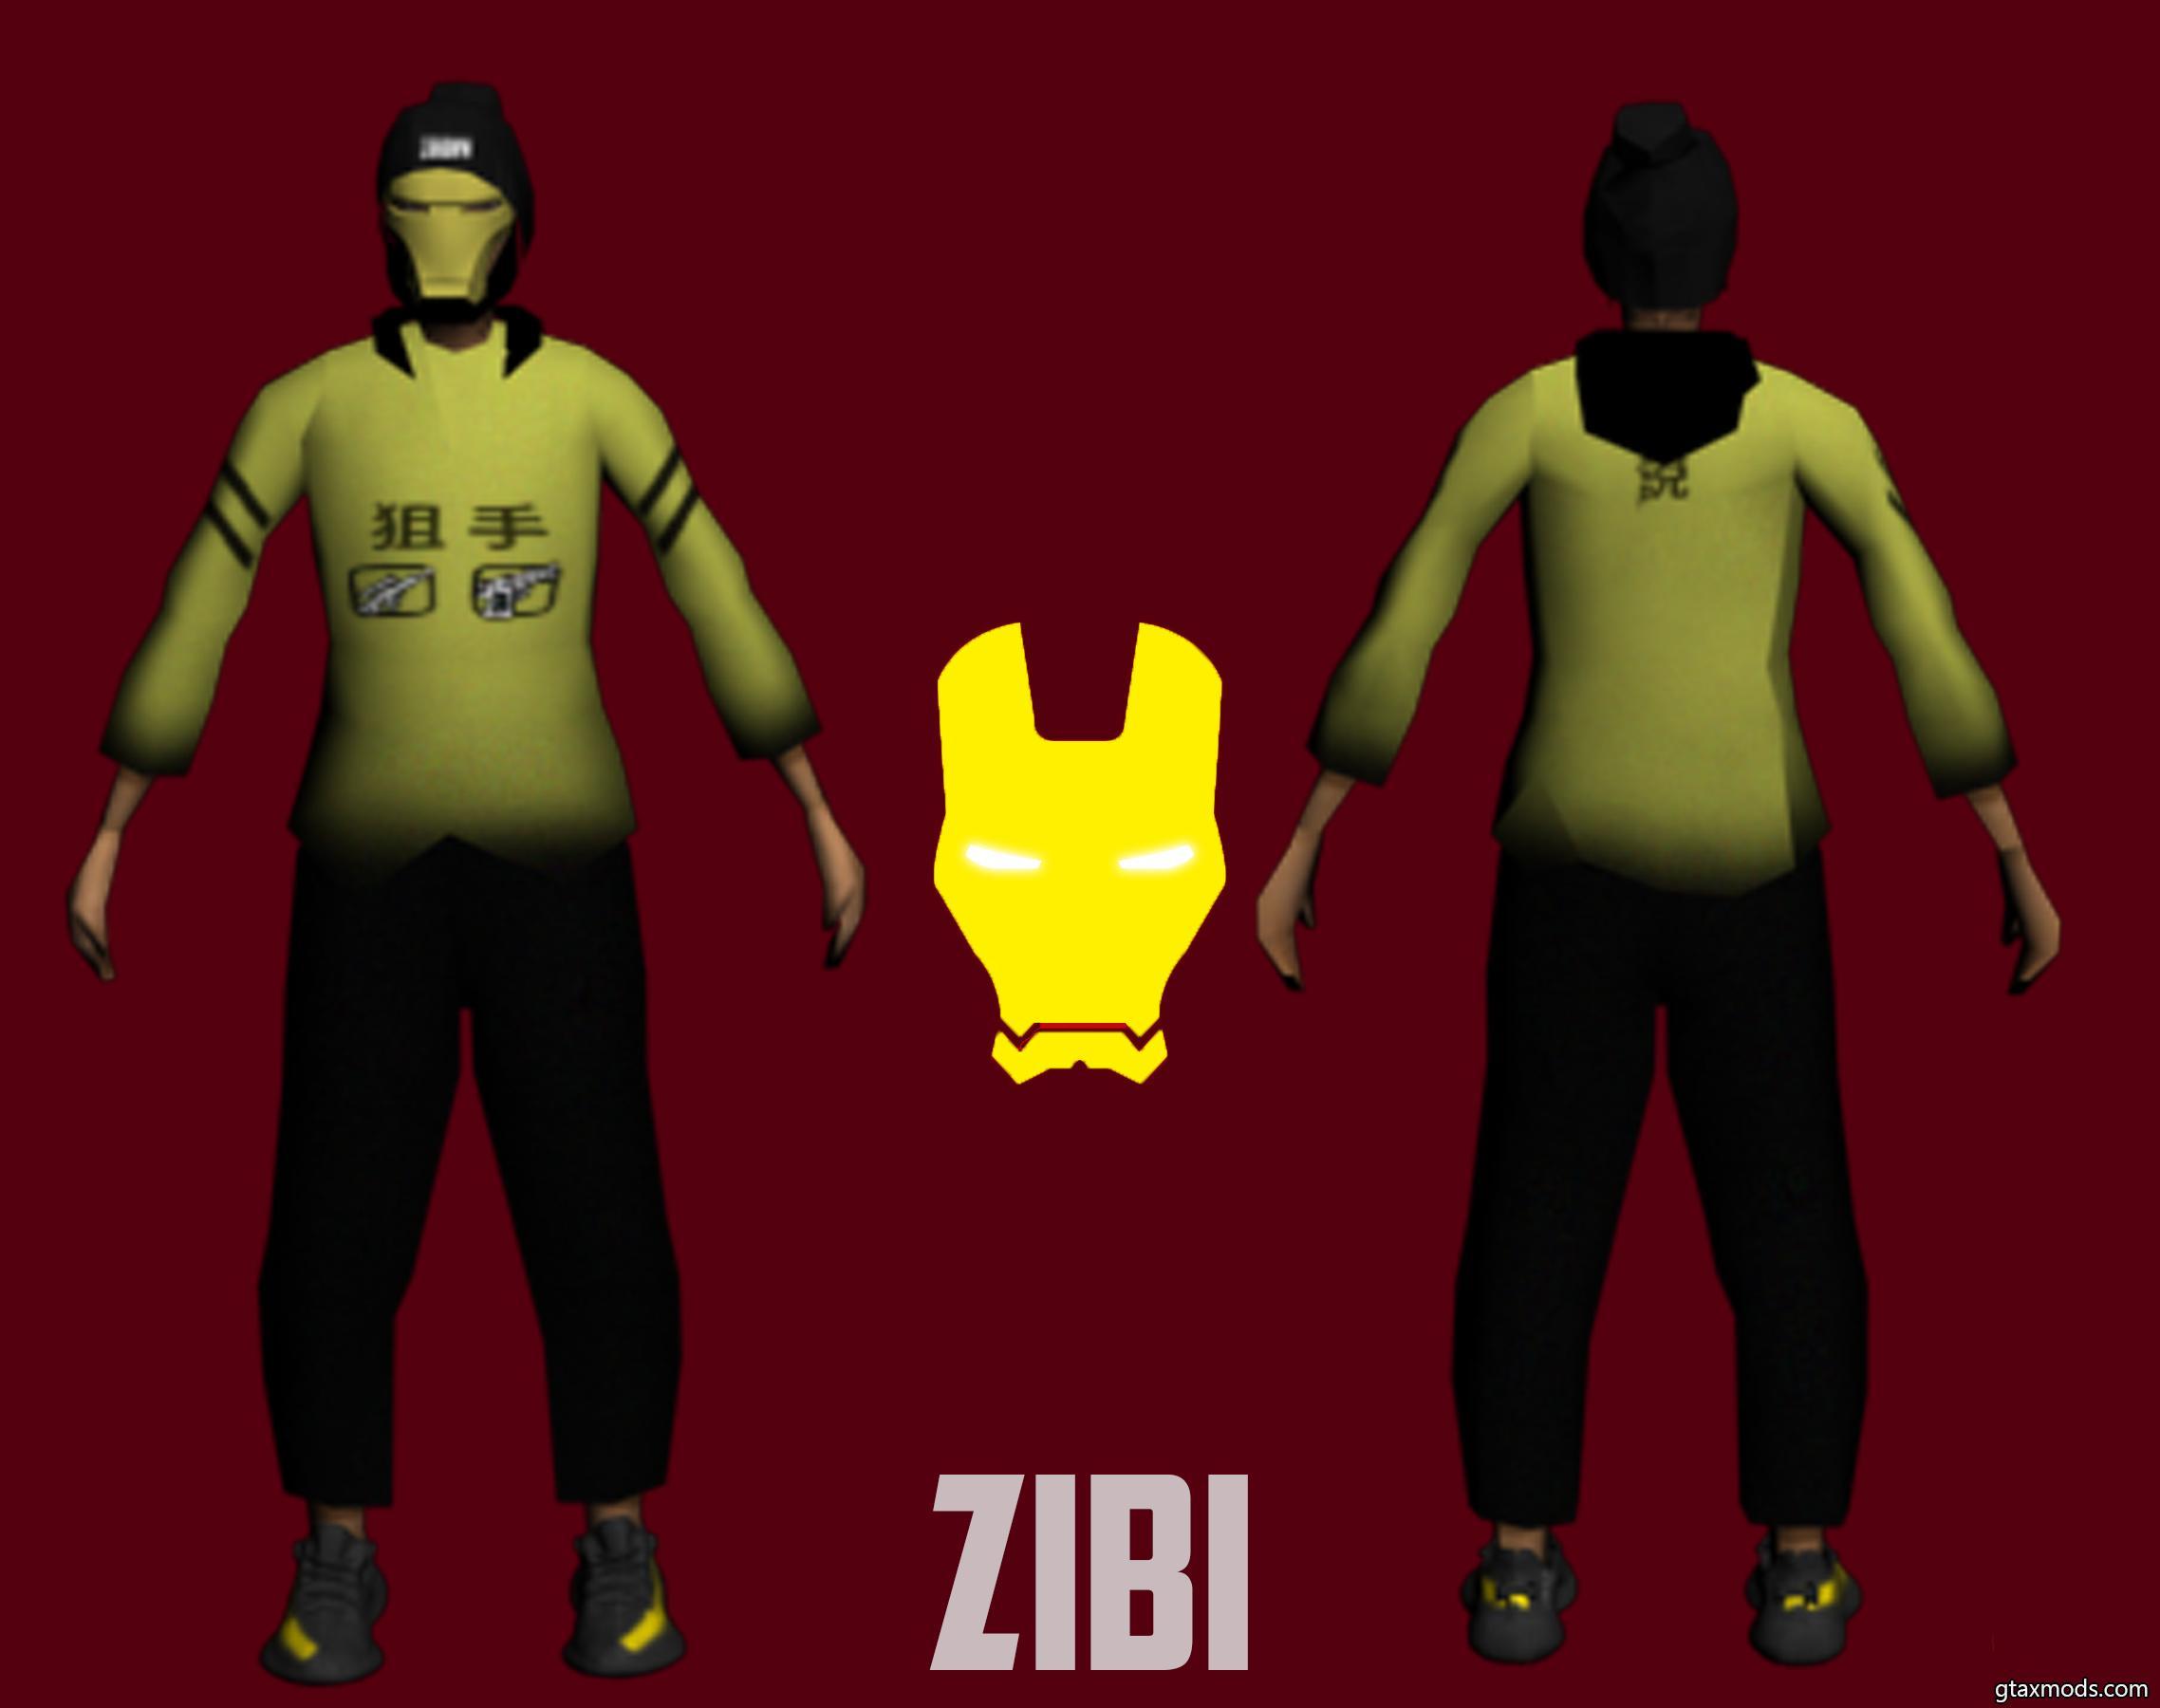 zibi skin | short ironman skin